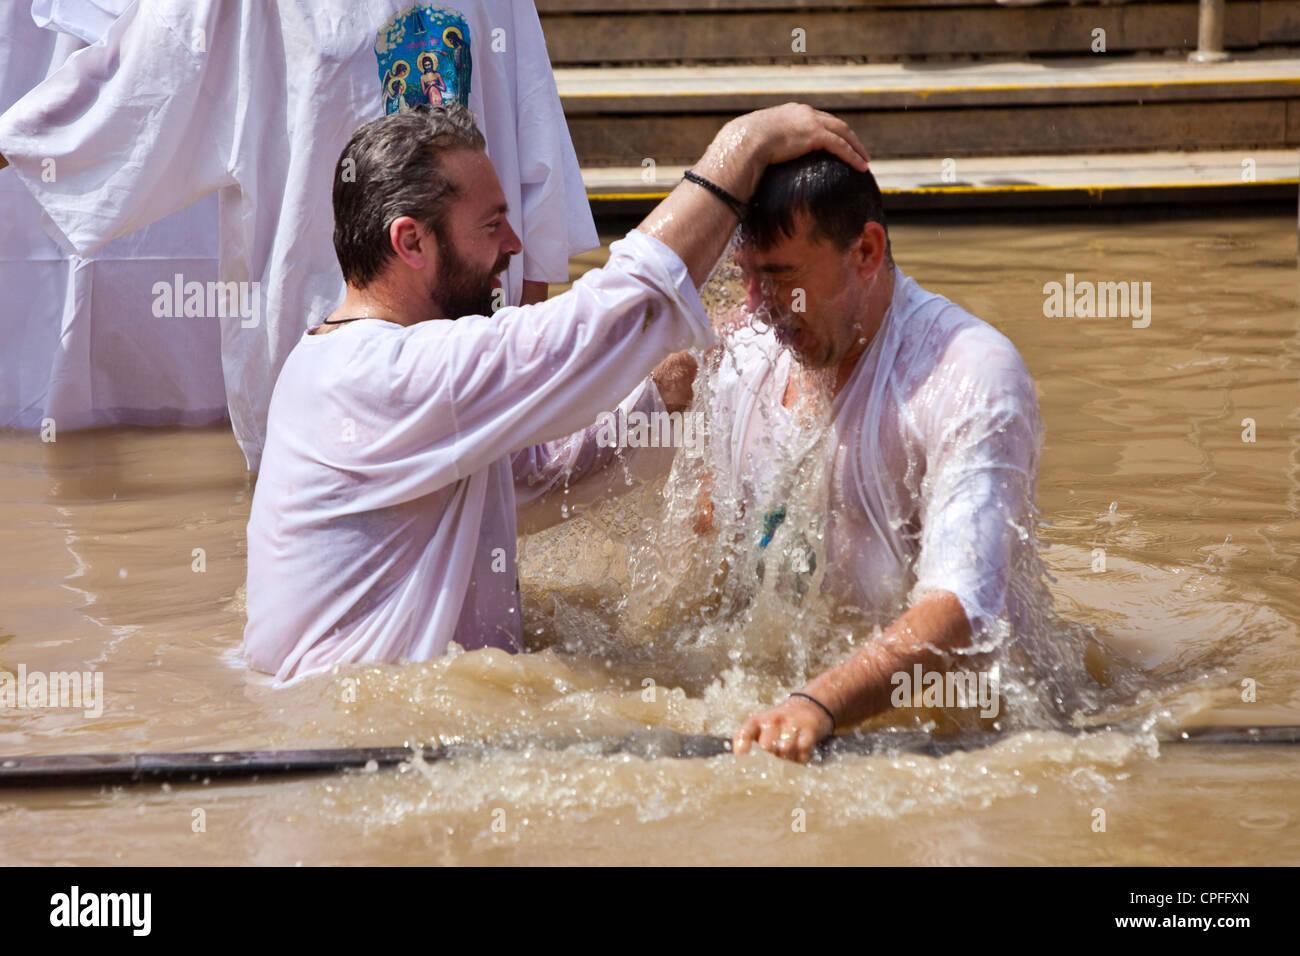 christian baptism - photo #31